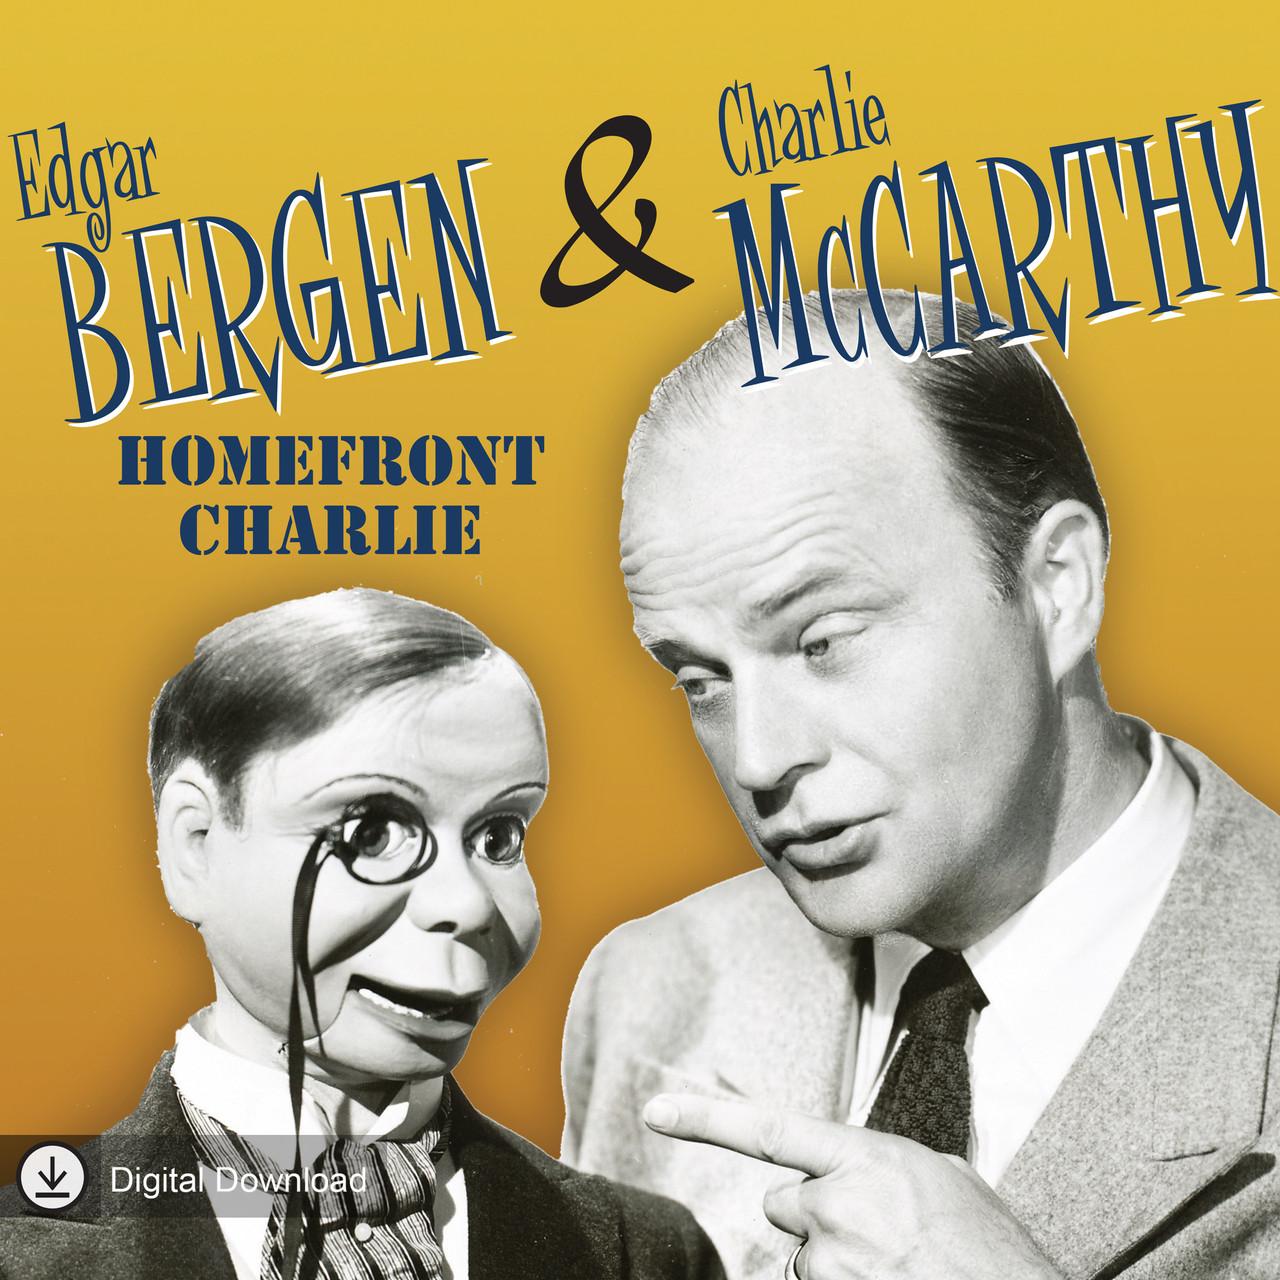 Bergen & McCarthy: Homefront Charlie (MP3 Download)